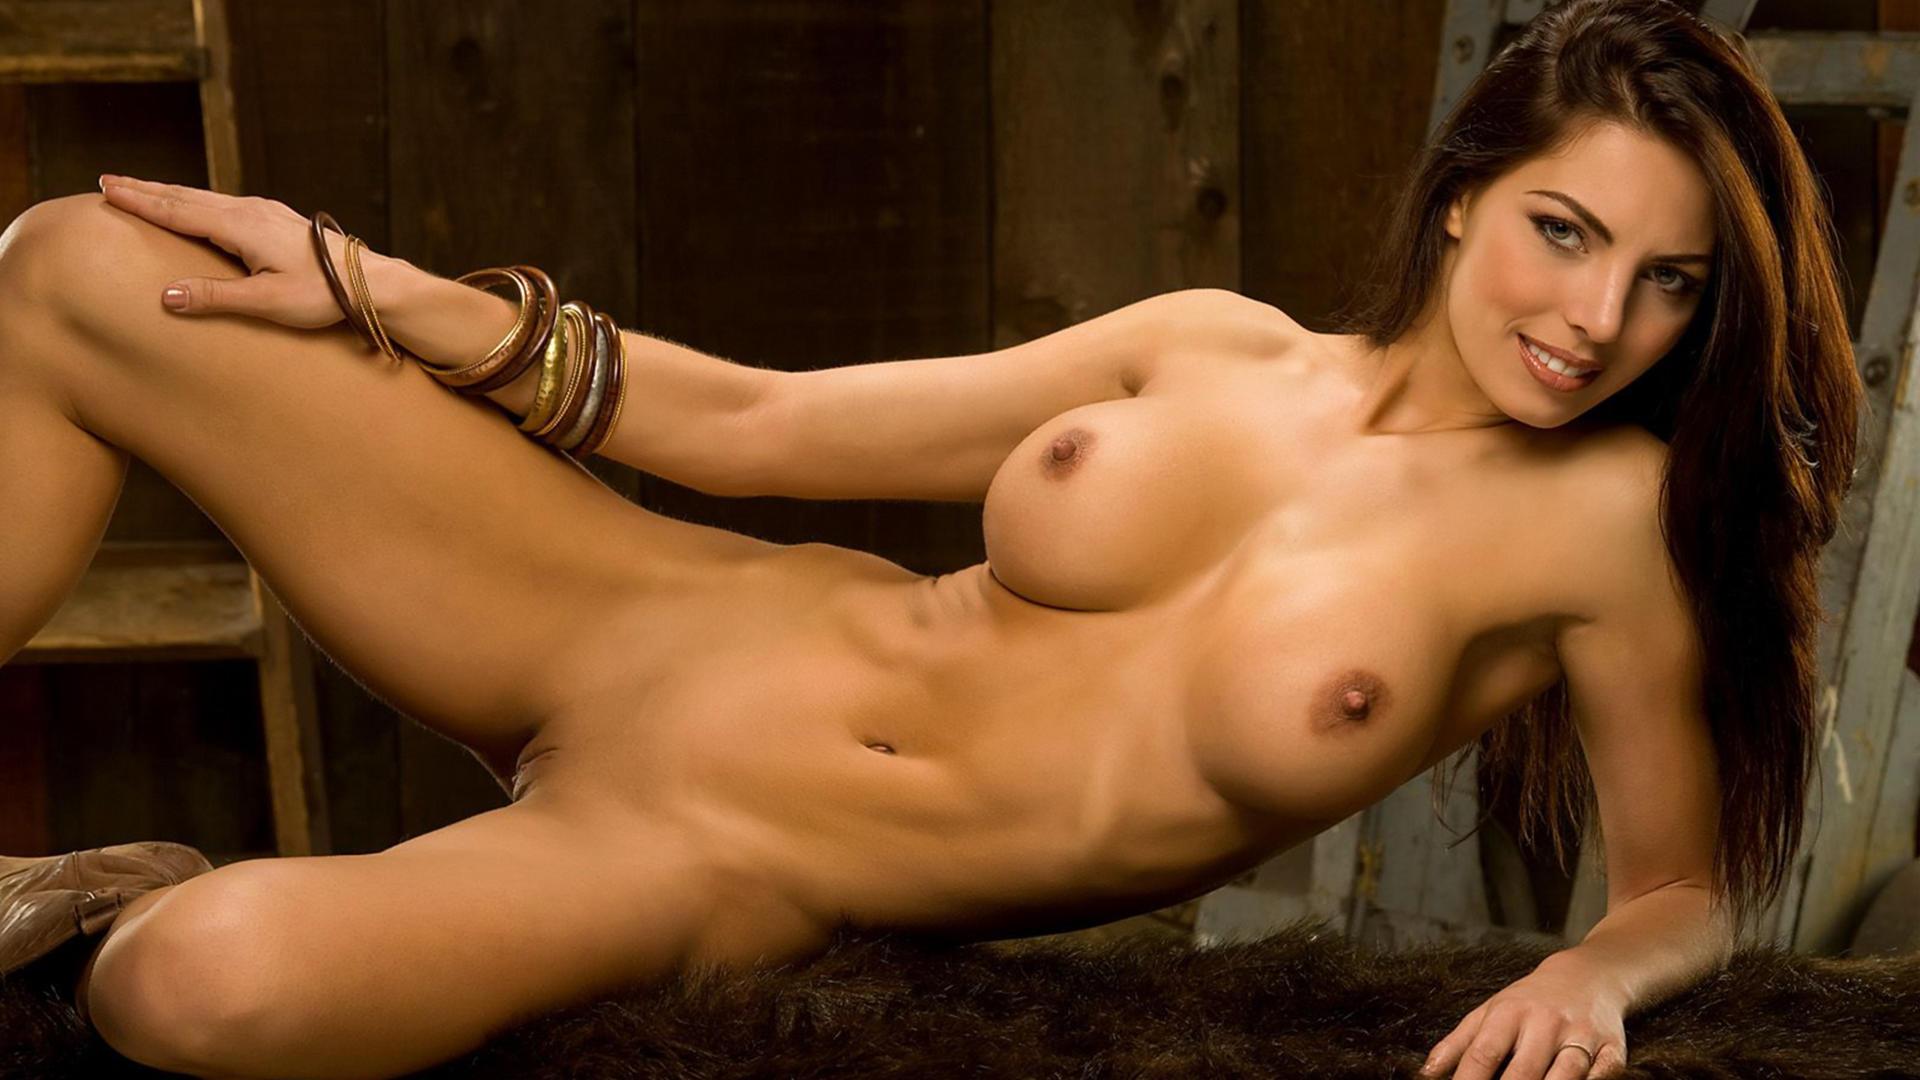 Hots Adrianna Meehan Naked Pics